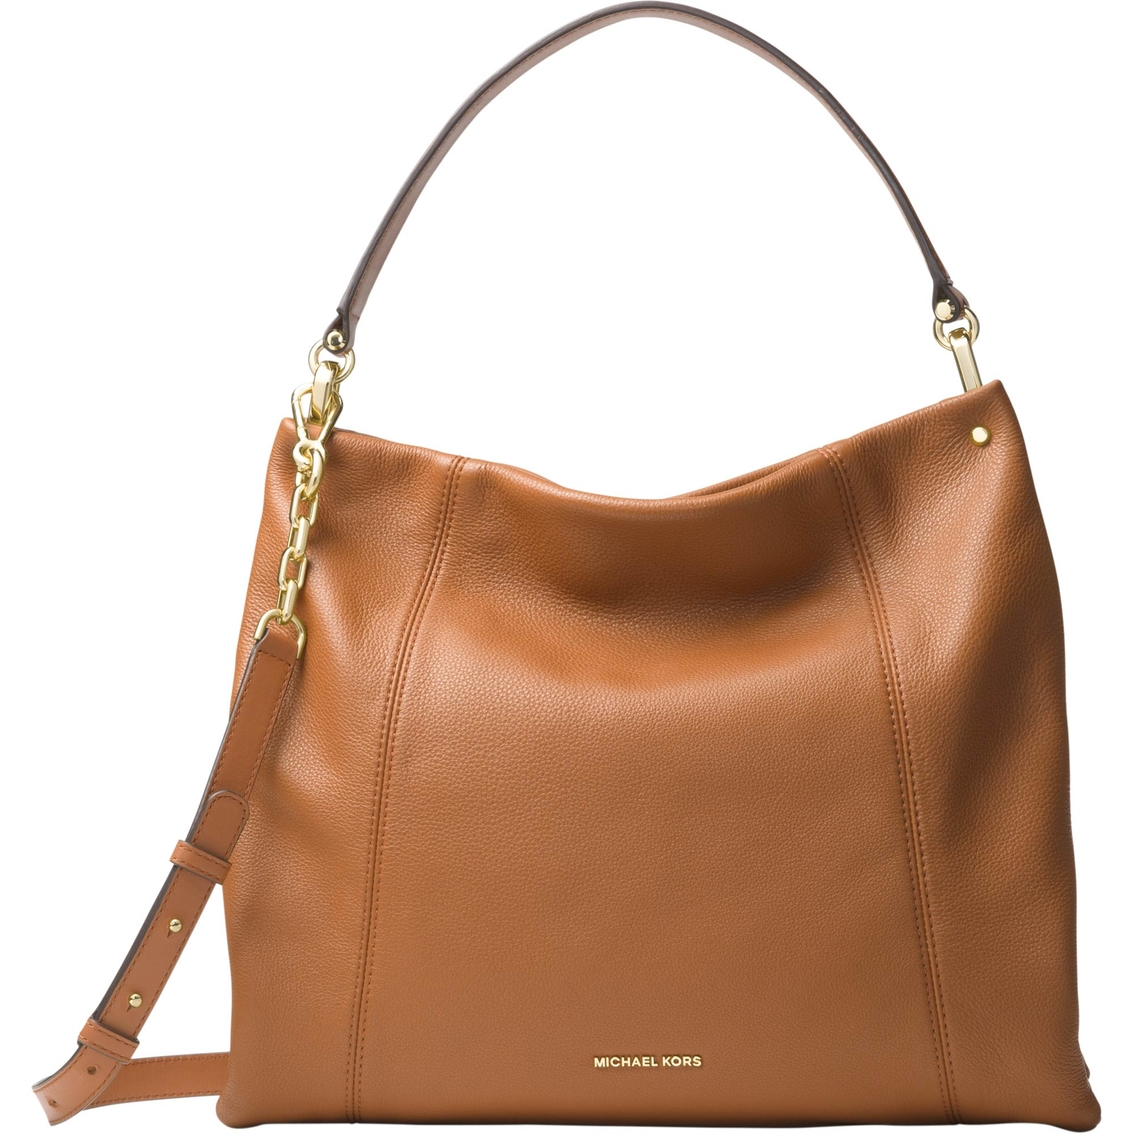 128824bef18872 Michael Kors Lex Large Convertible Hobo Handbag | Hobo Bags ...